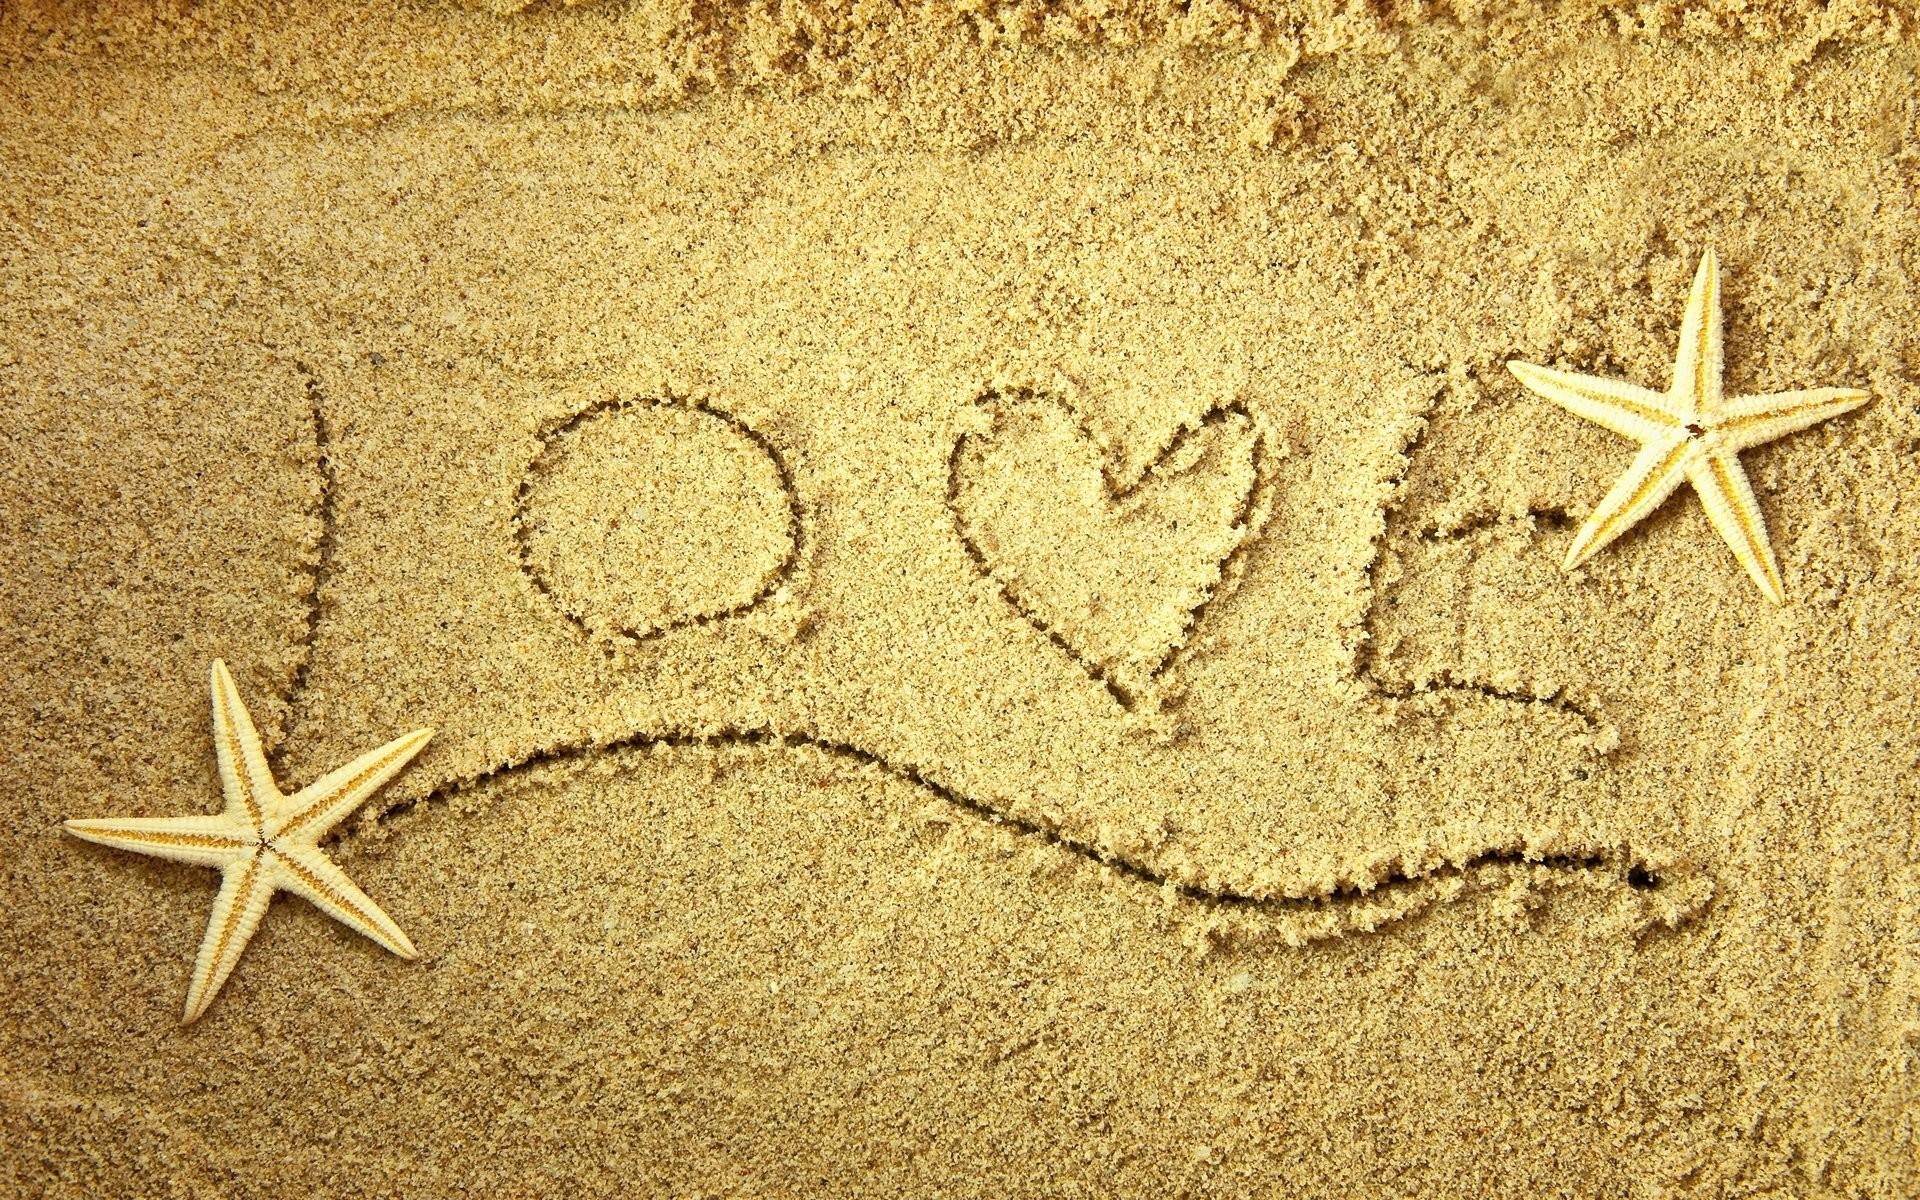 Beach Love 731153. SHARE. TAGS: Desktop Static Beautiful Christmas Love